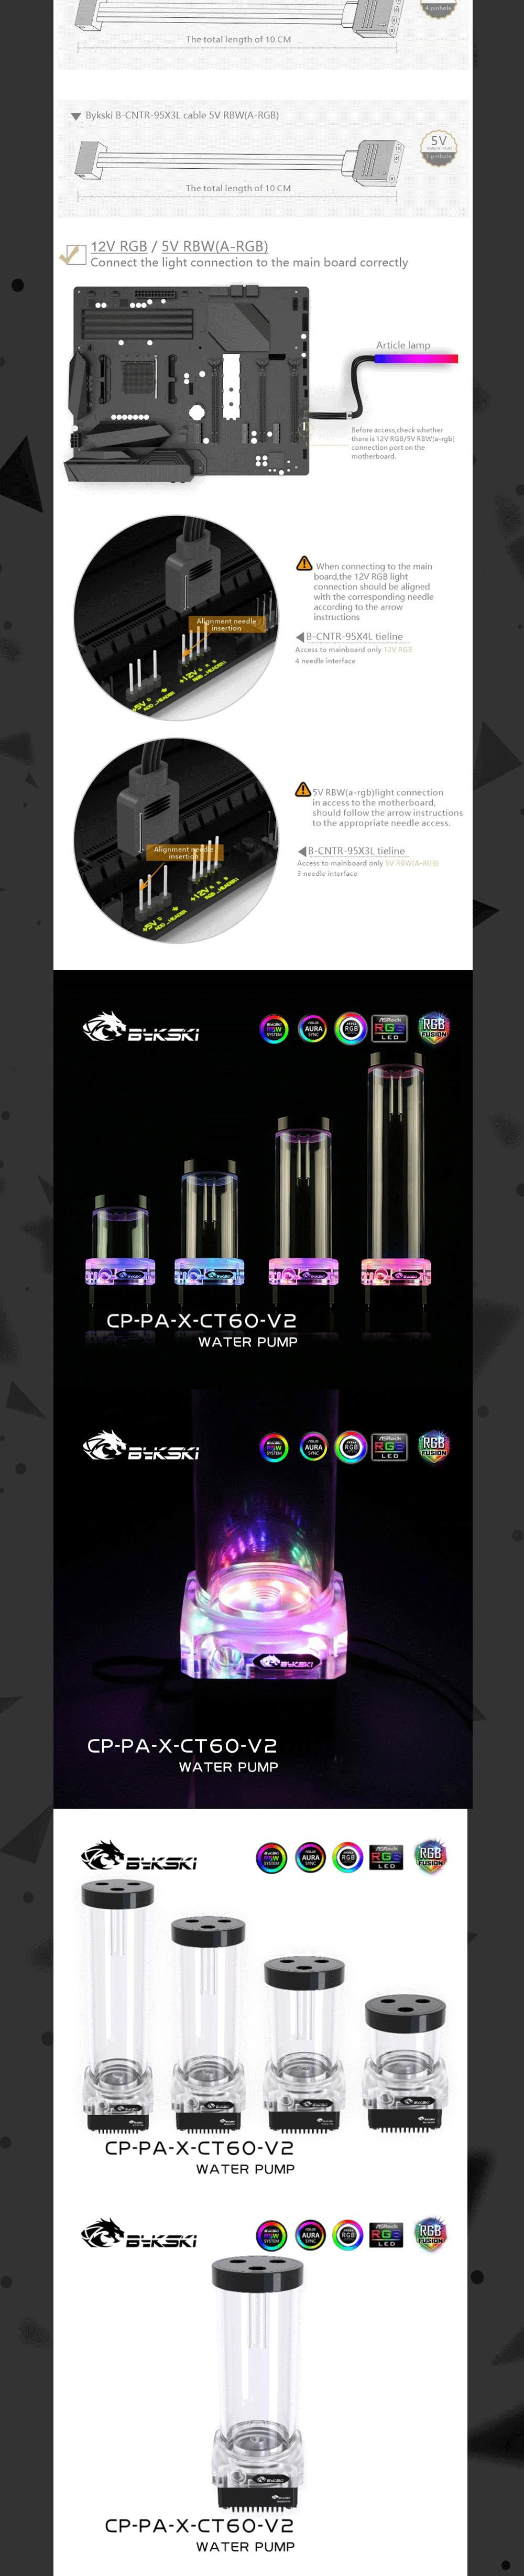 Bykski CP-PA-X-CT60 / CP-PA-X , Pump-reservoir Combination , 10W Pump With Lighting Max Flow 300L/H Max Head 3M